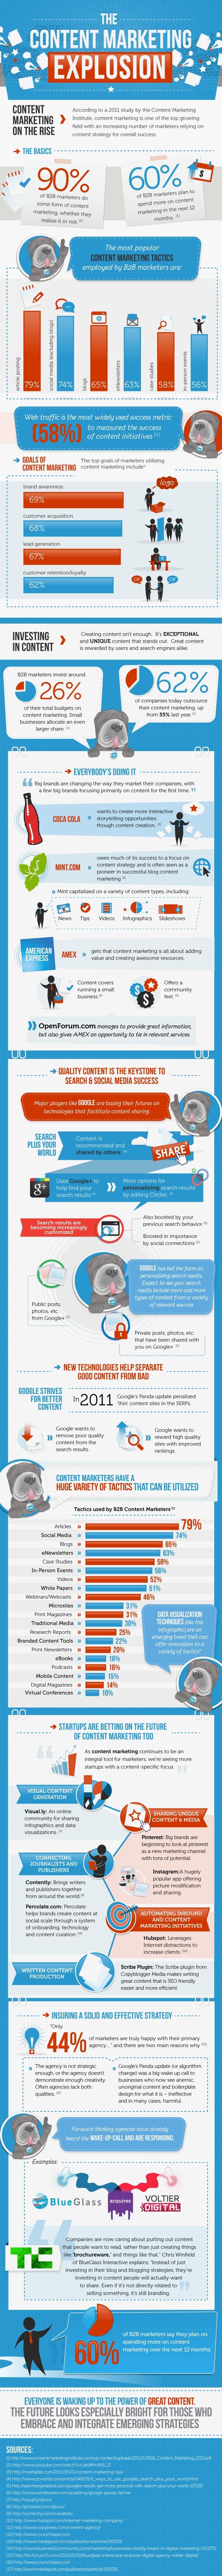 ContentMarketinginfographic